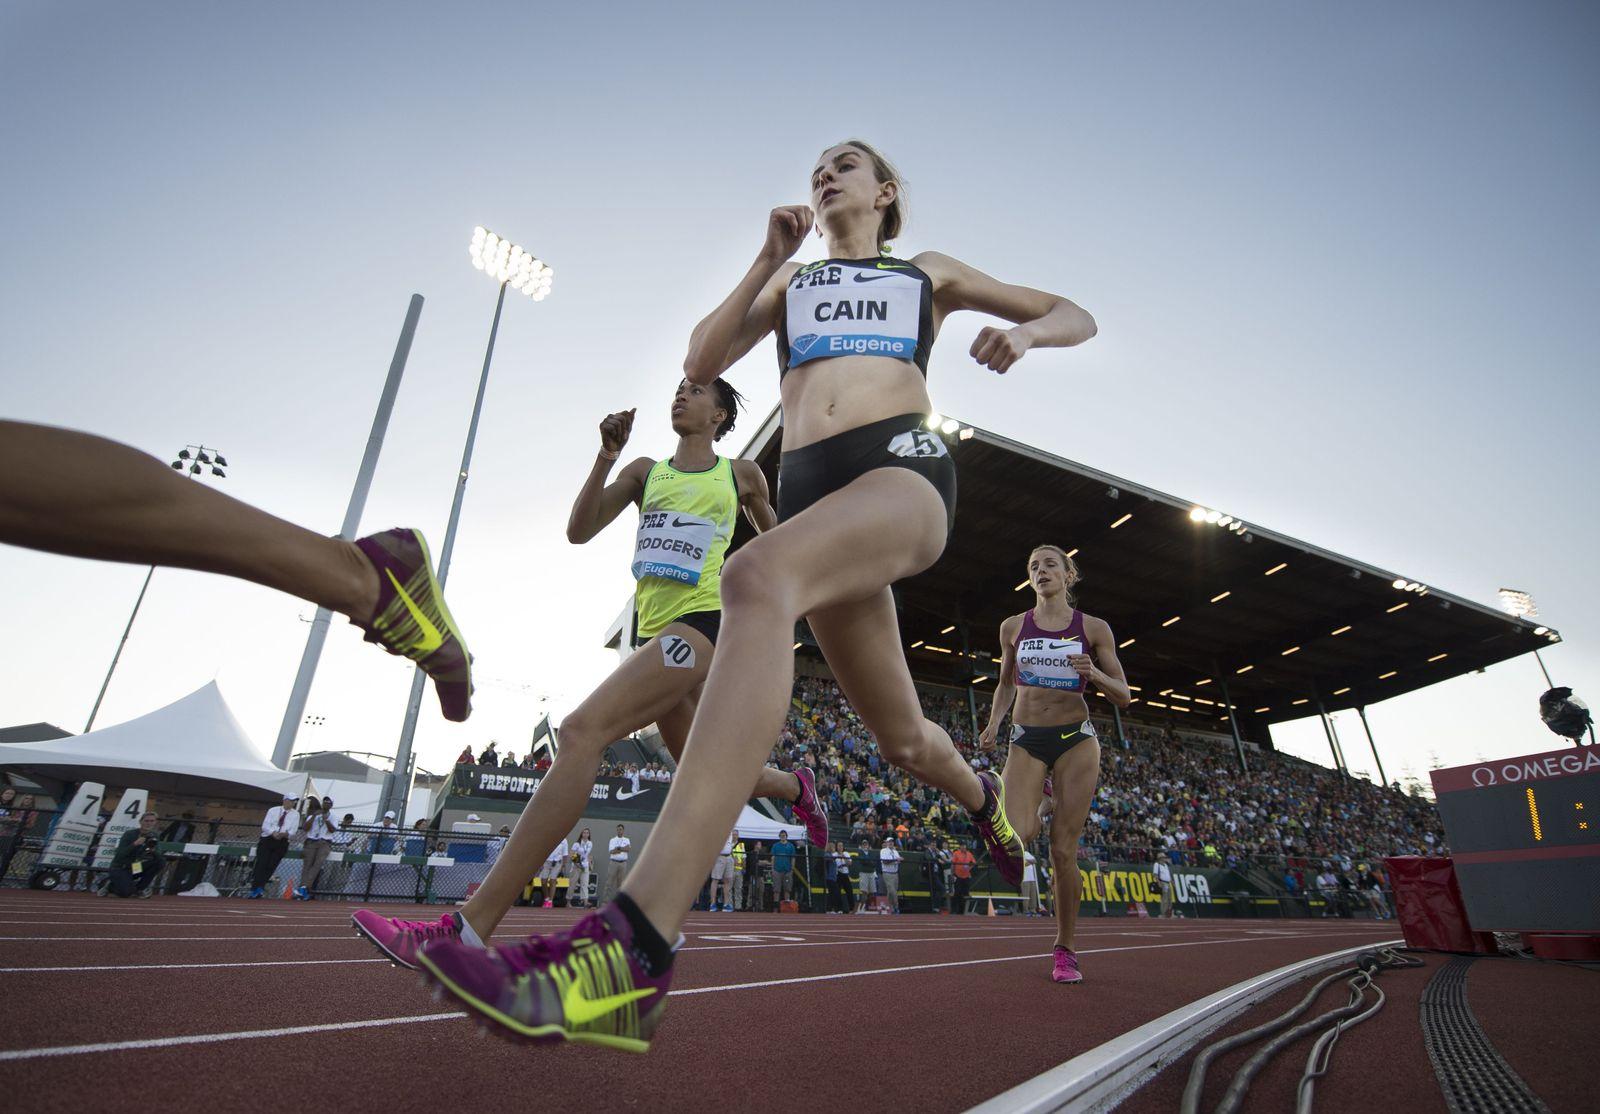 EINMALIGE VERWENDUNG Nike Oregon Project/ Mary Cain